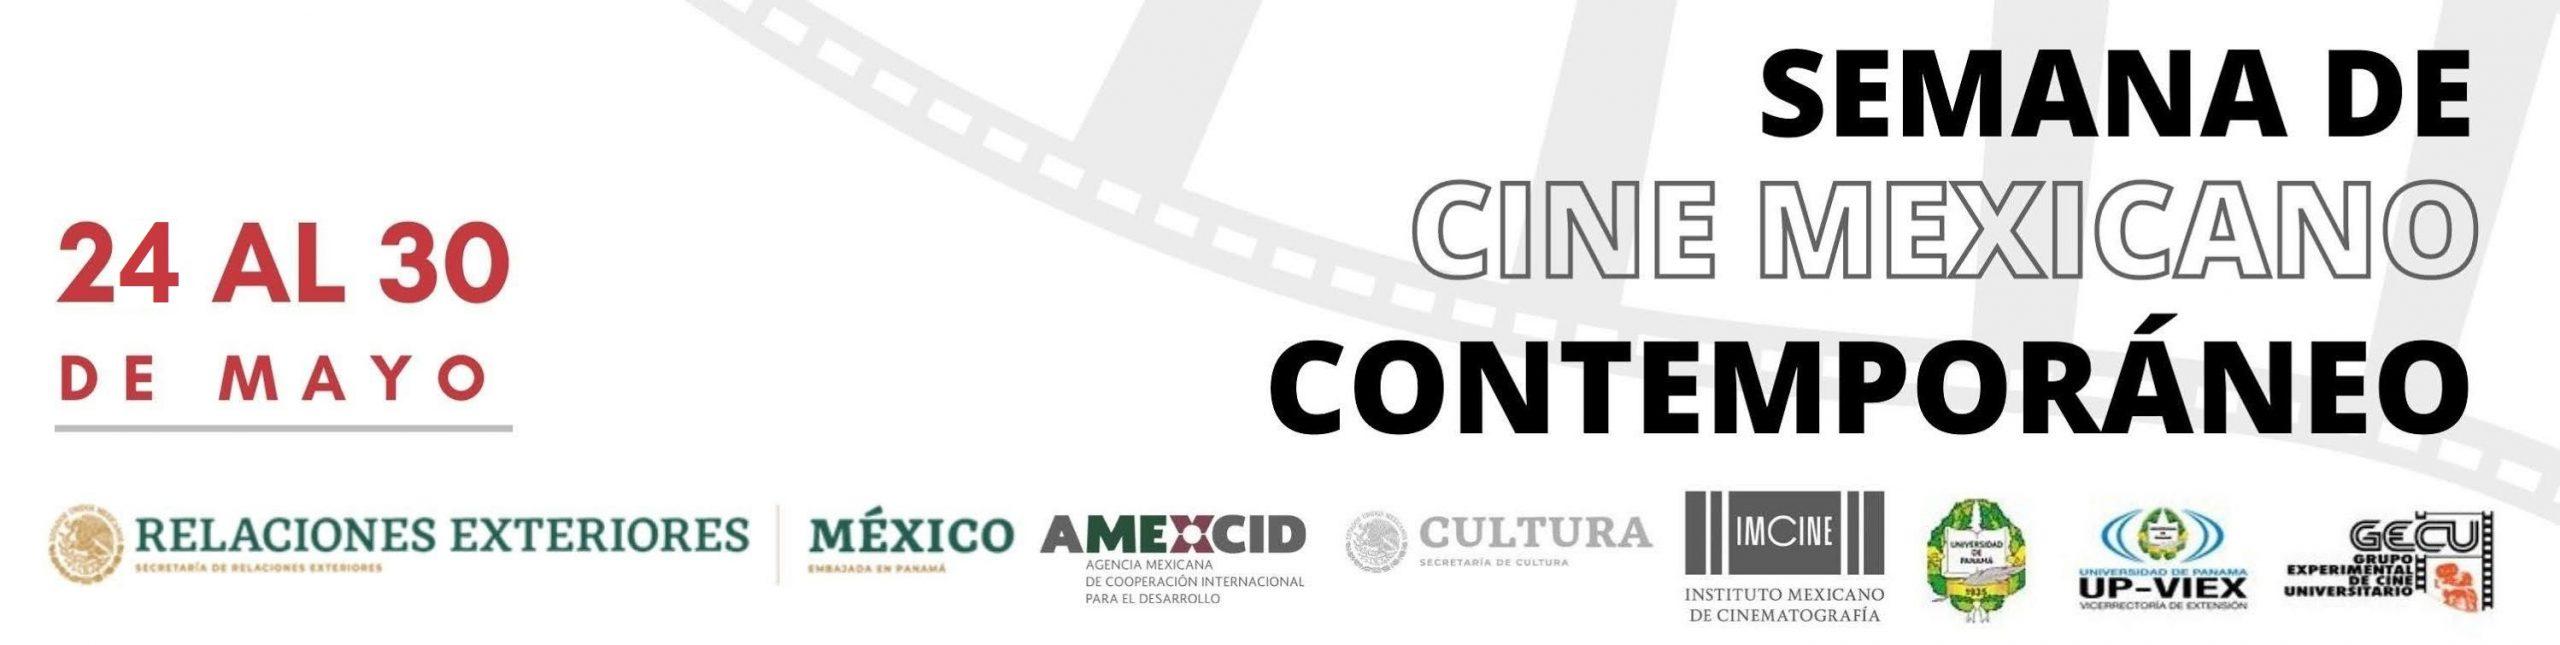 Agenda #ArteCultura Mayo 2021